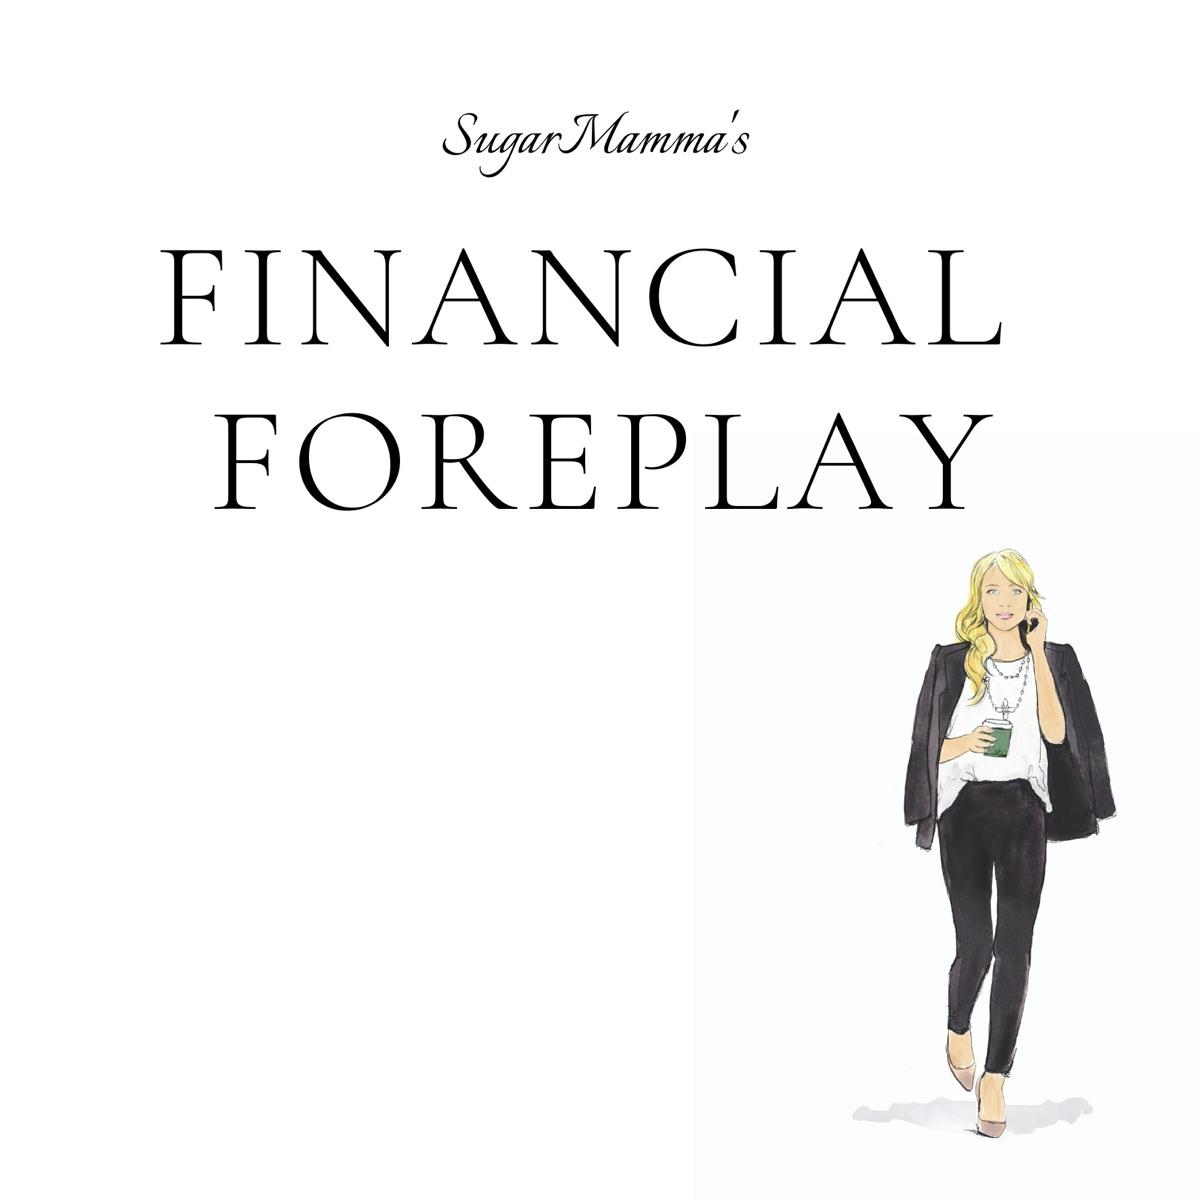 SugarMamma's Financial Foreplay